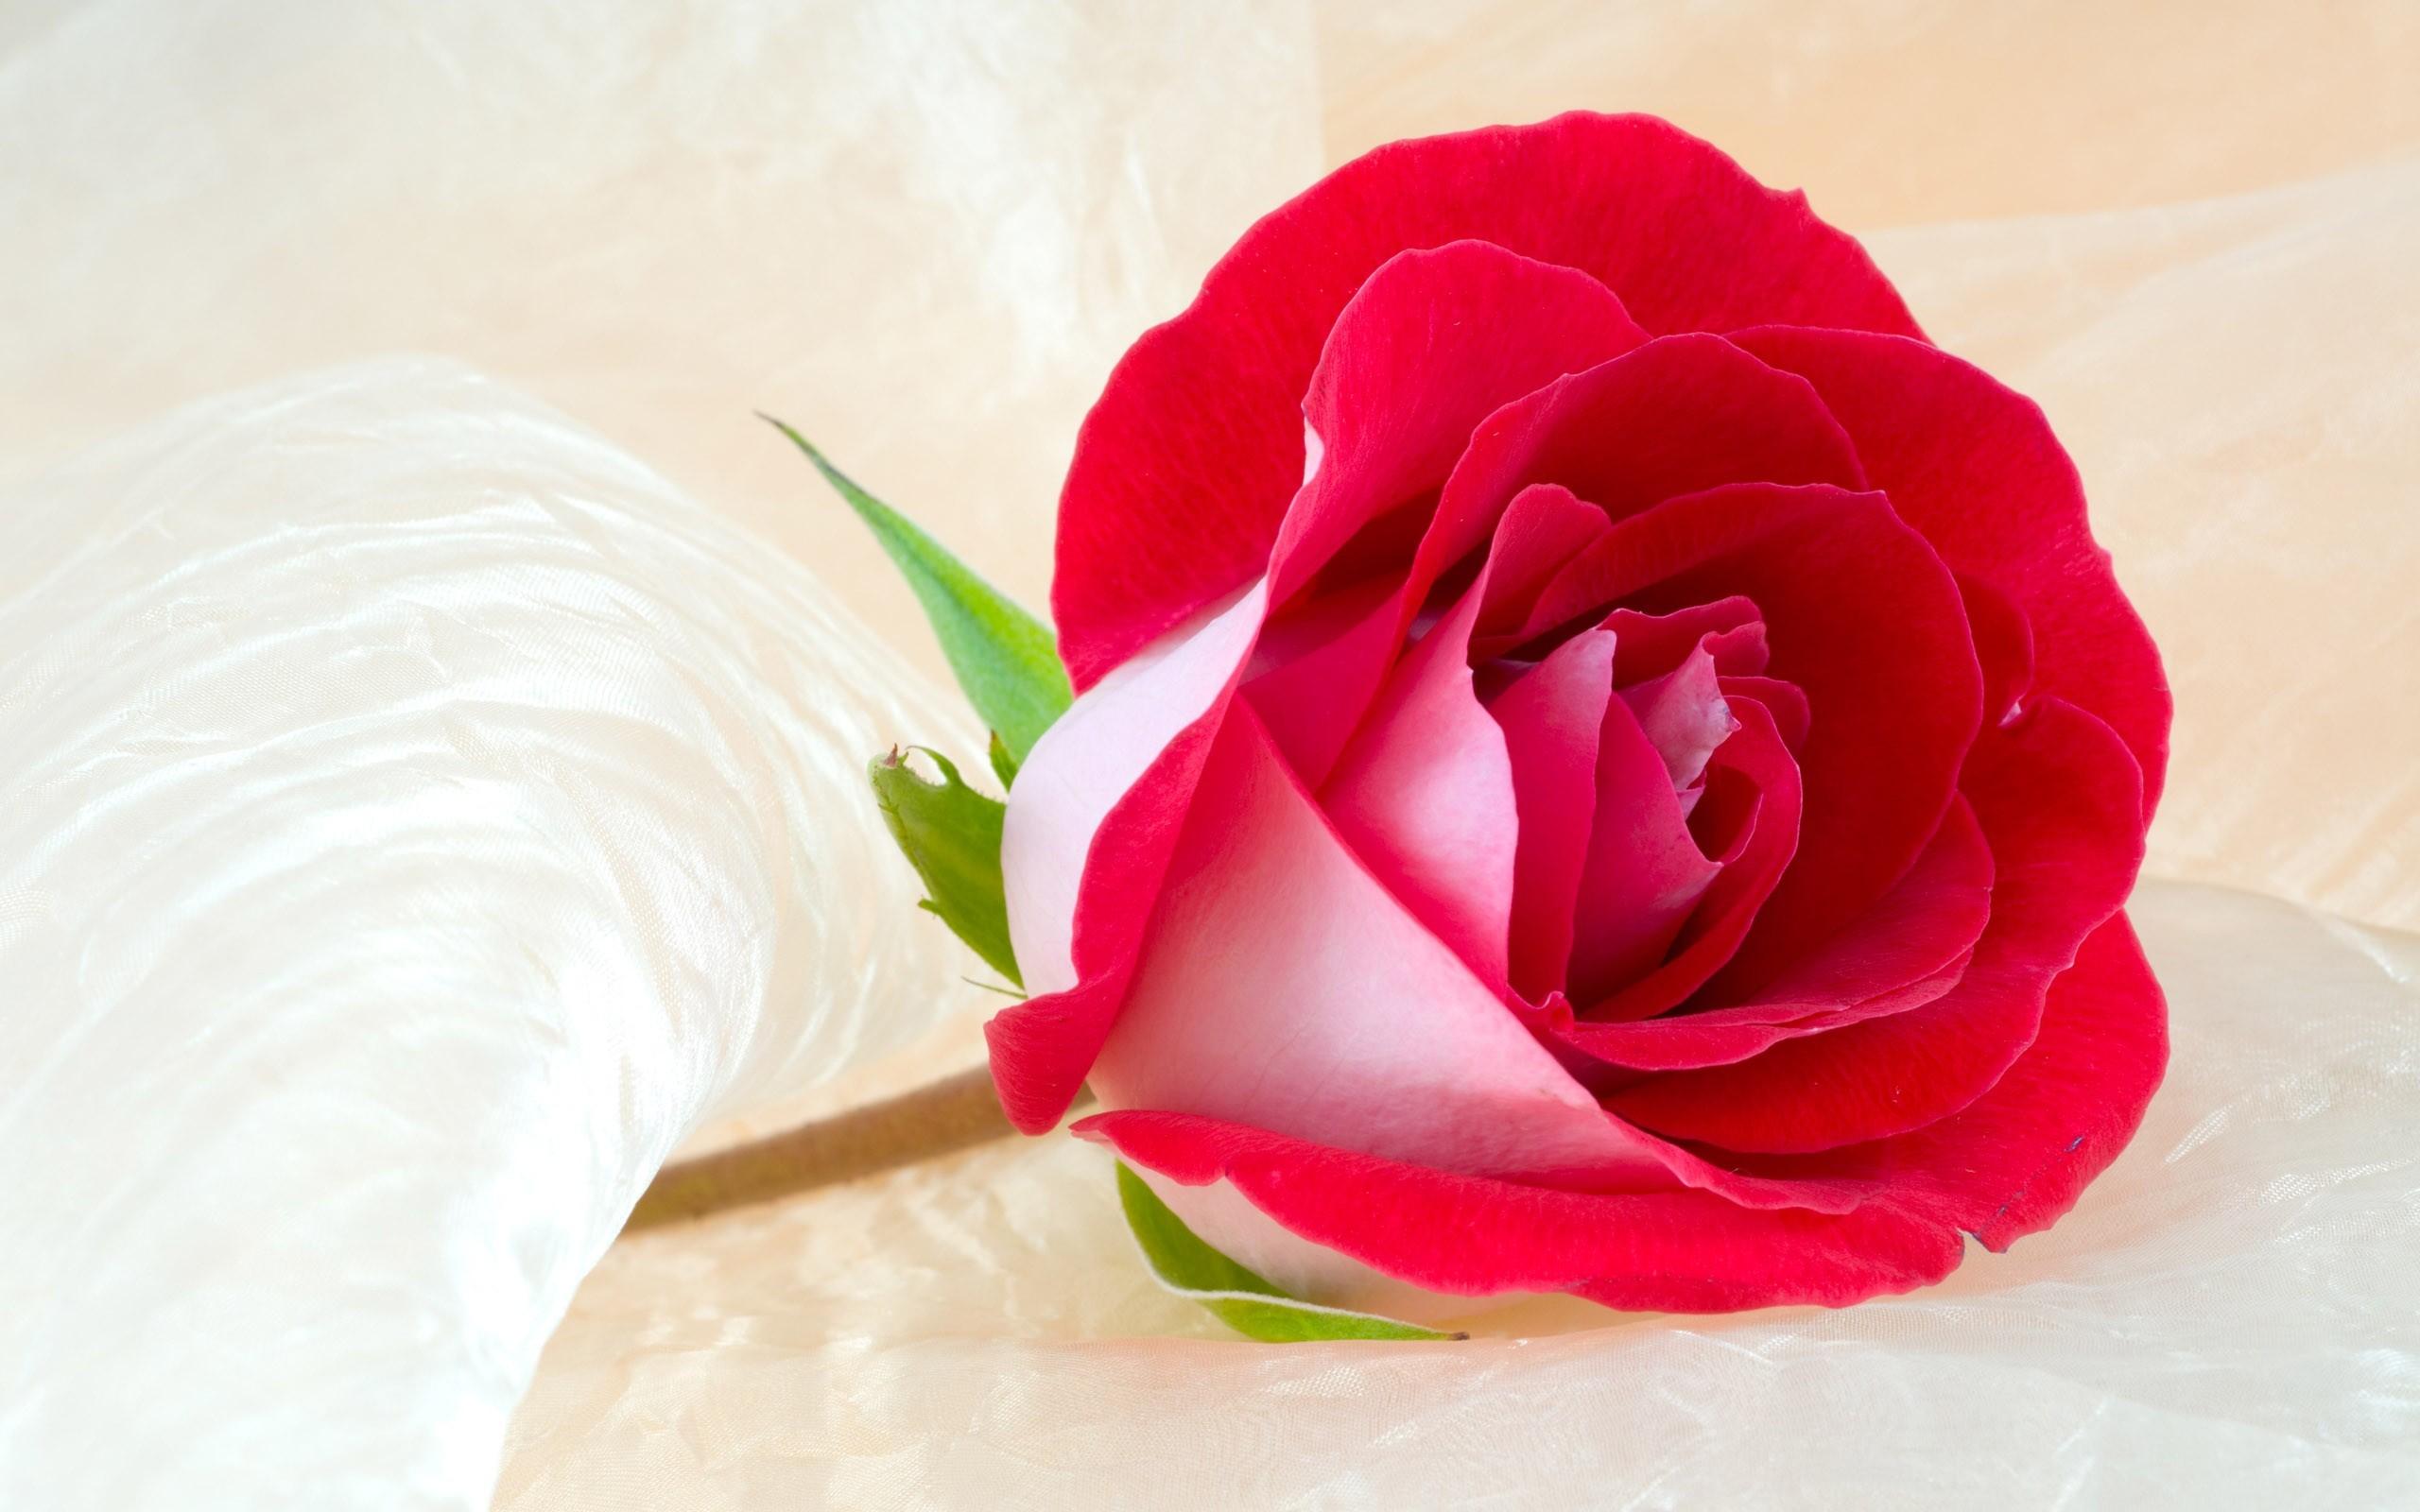 rose background images